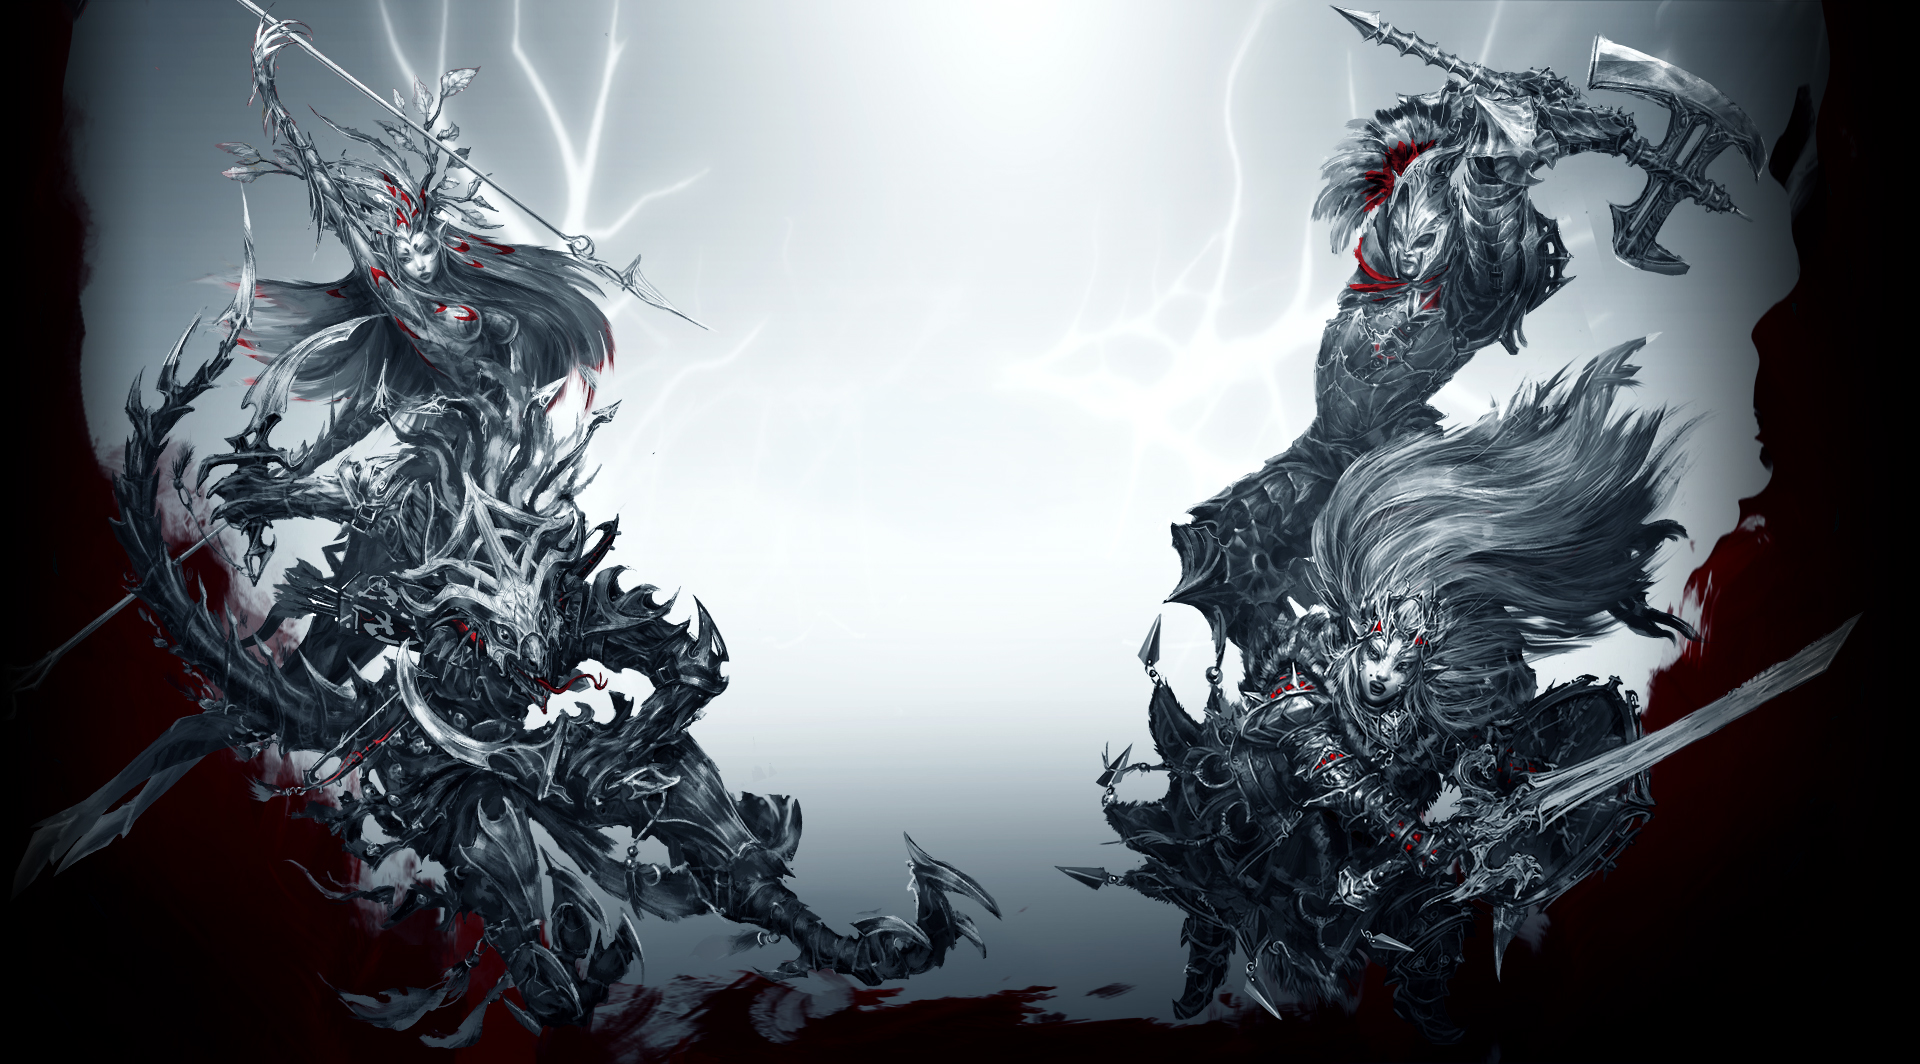 Zbiórka na Divinity: Original Sin II ruszy 26 sierpnia - obrazek 1